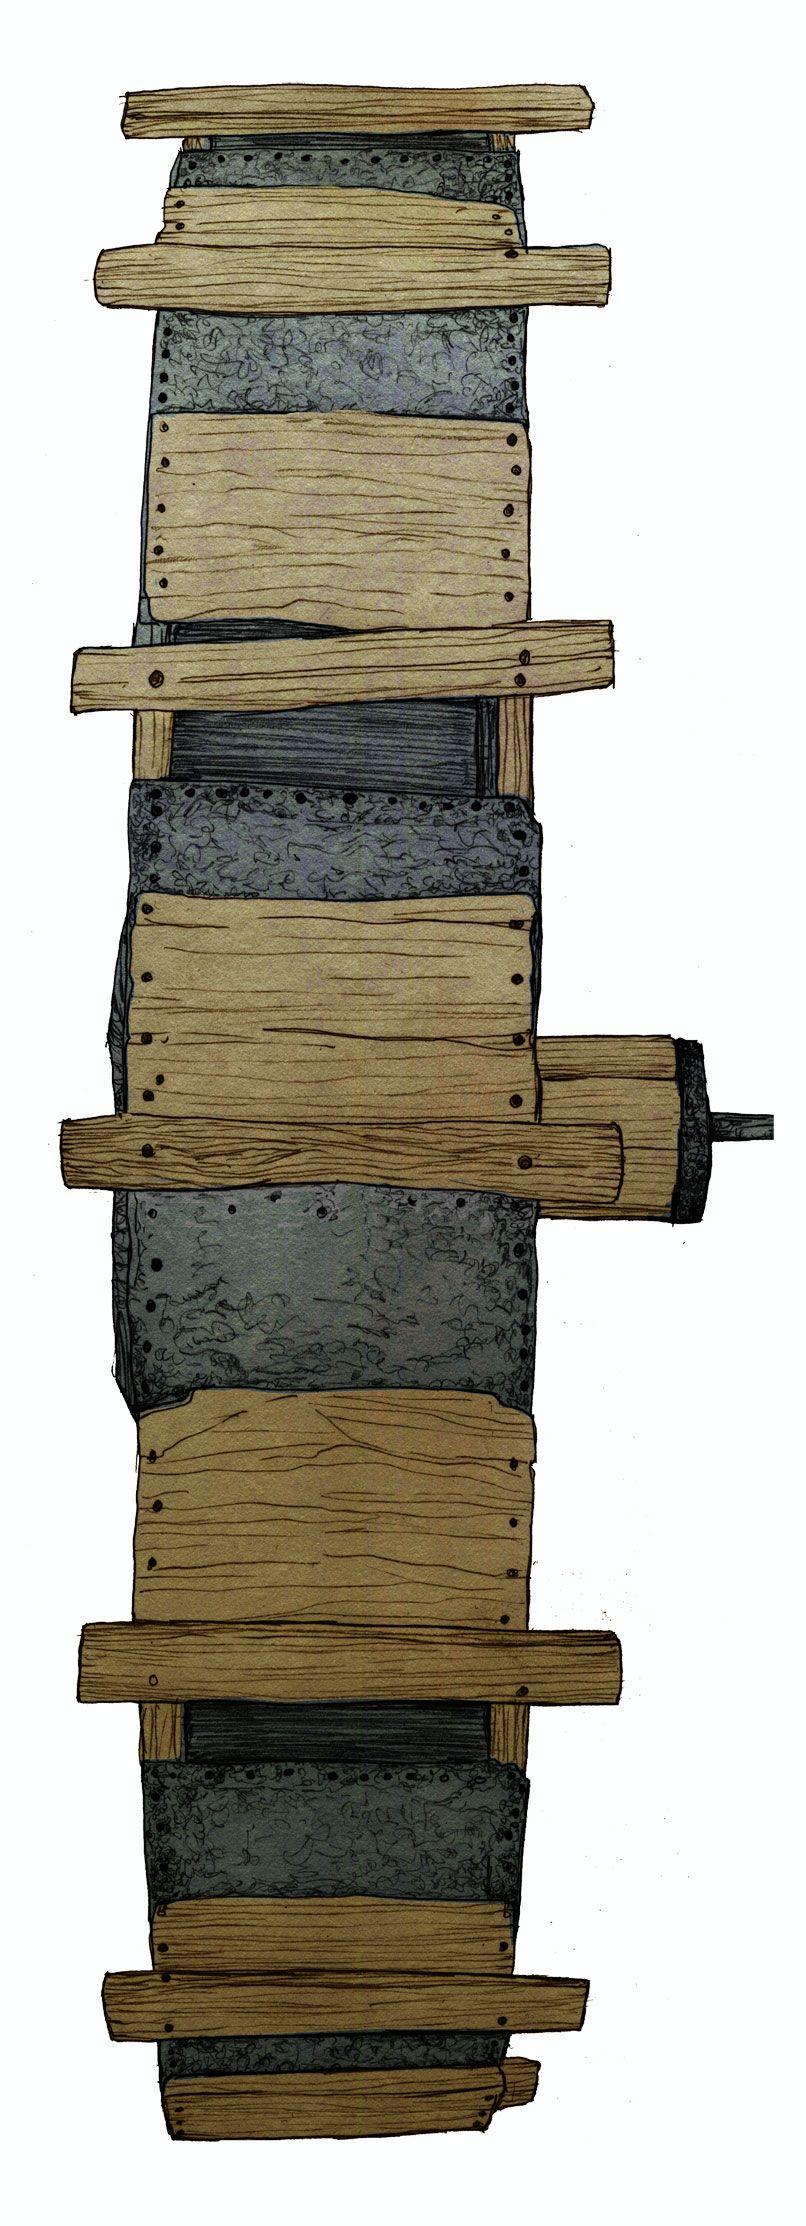 Bombillo (sénia) elevar aigua / Bombillo (noria) elevar agua